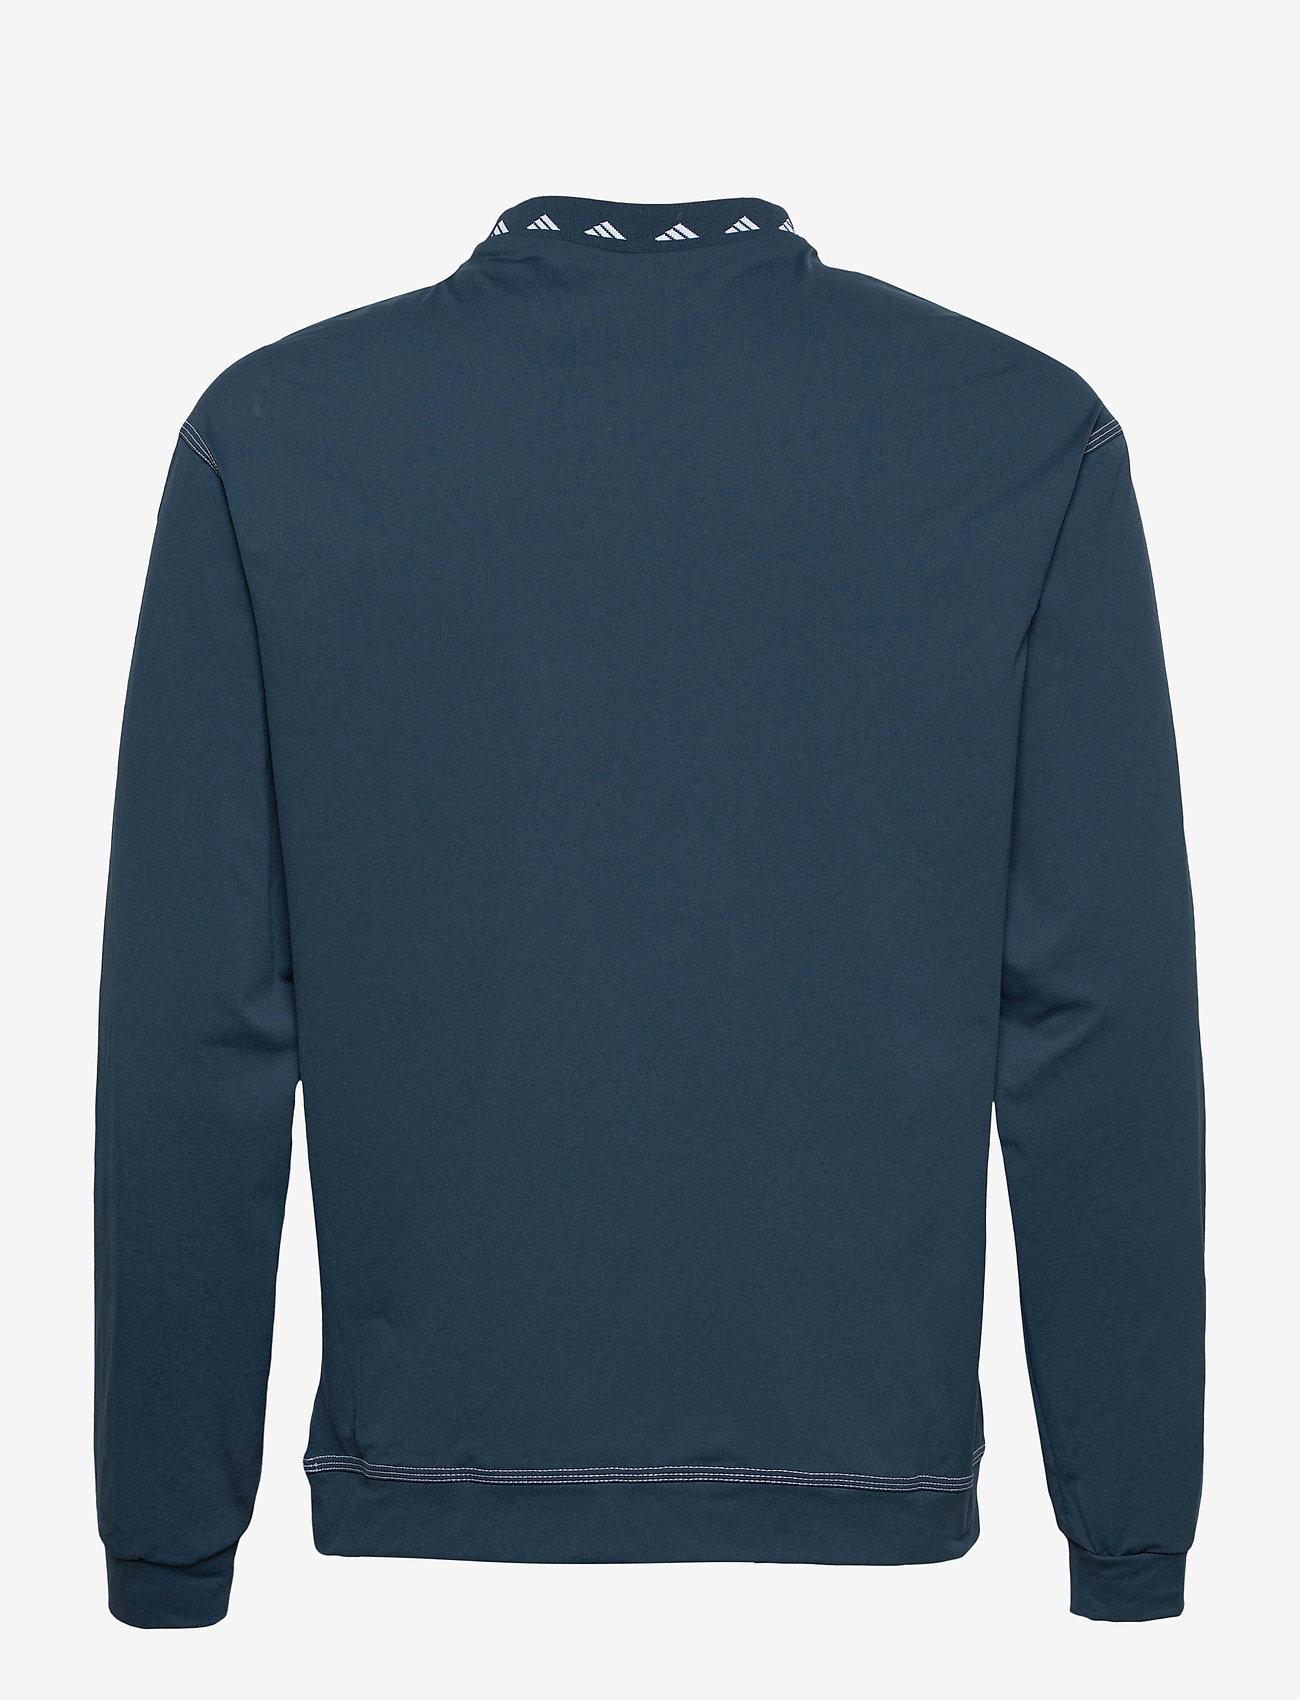 adidas Golf - EQPMNT WIND CRW - golf jackets - crenav - 1